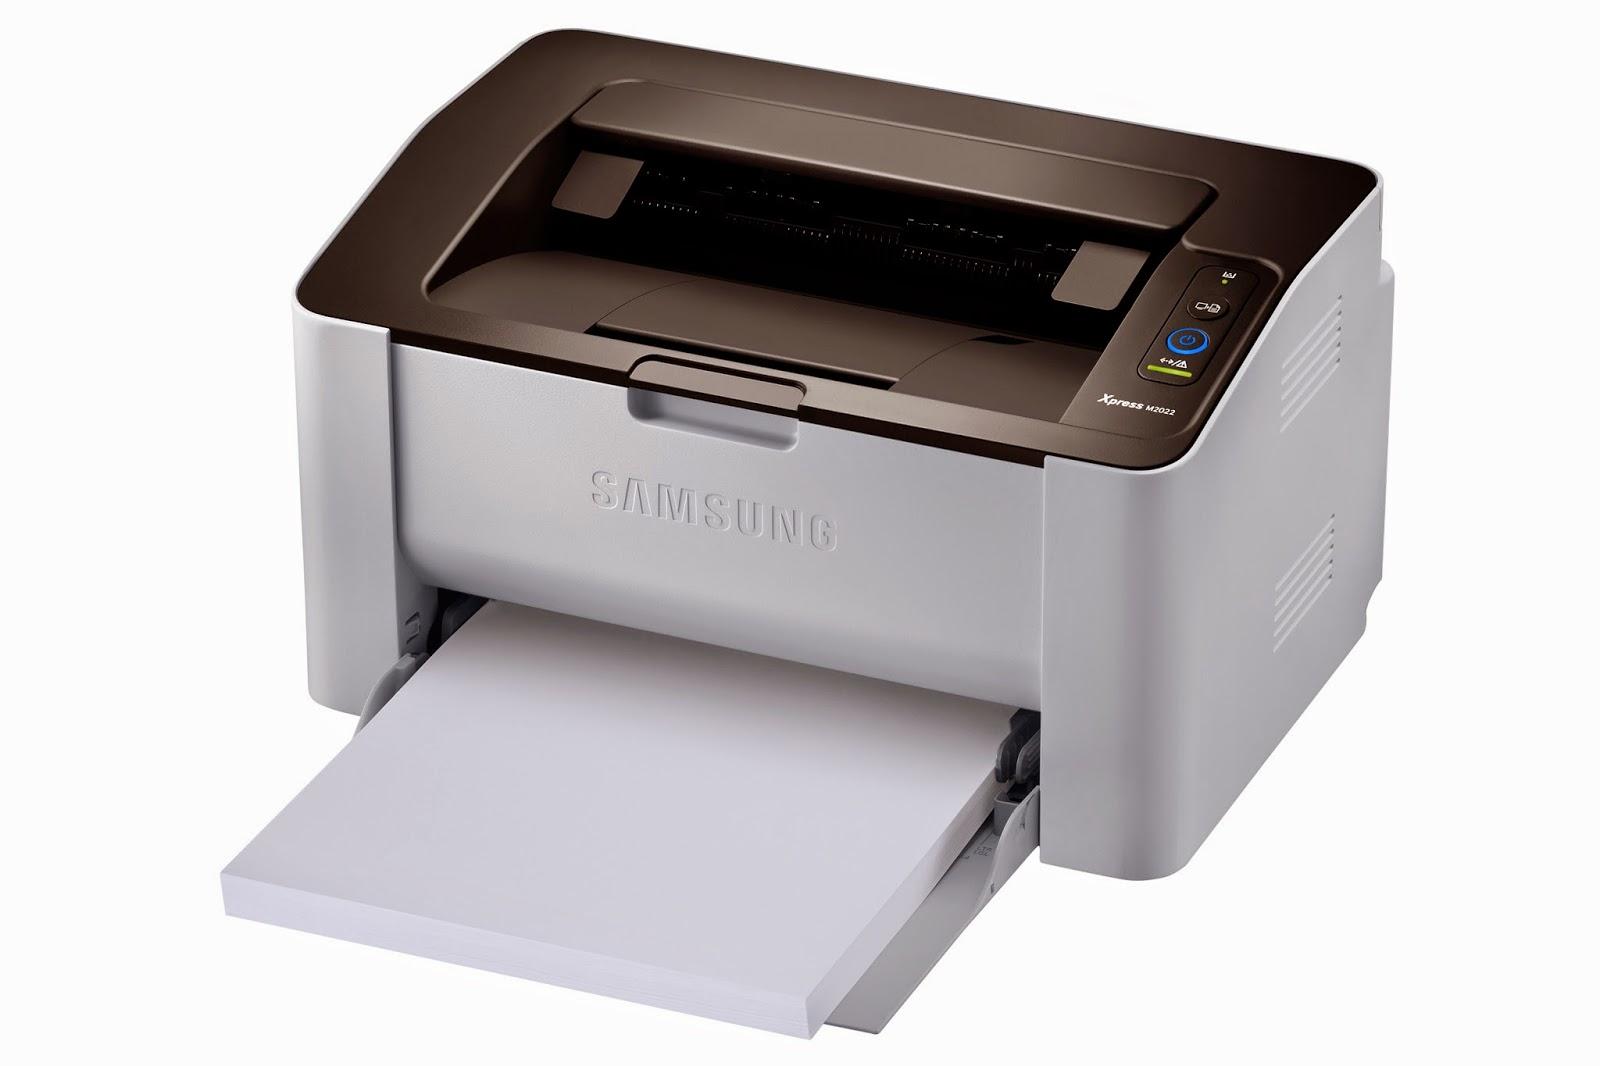 Stamps Com Prolabel Printer Driver Download